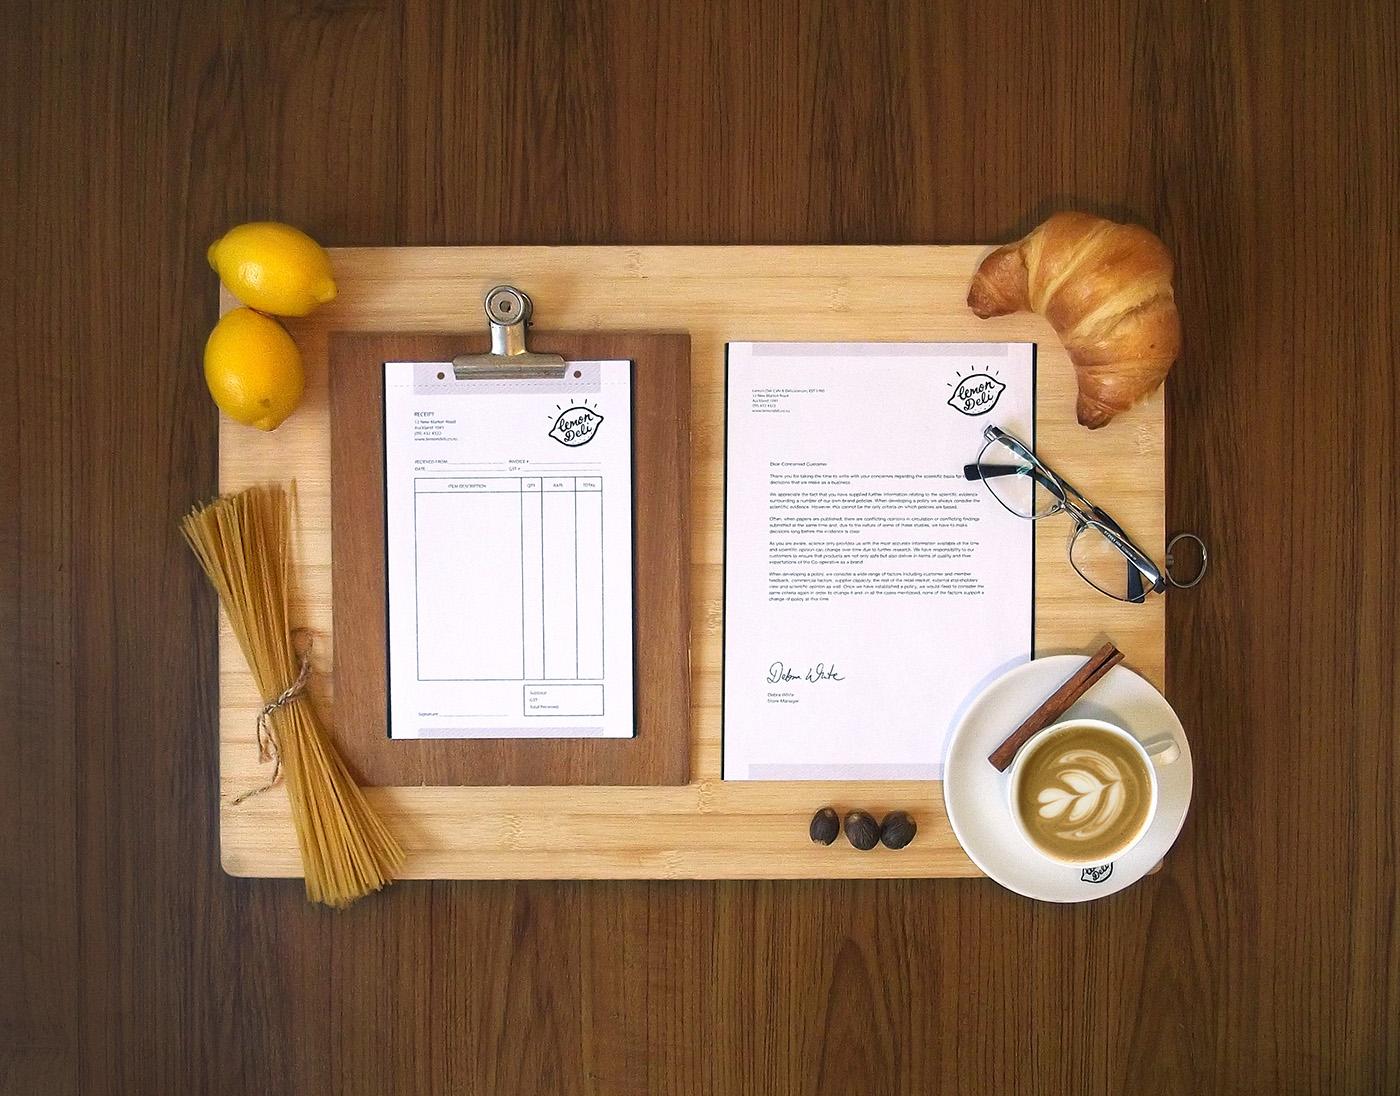 lettering brand deli delicatessen cafe vintage rustic labelling labels lemonade productdesign brand identity Retro package design  FMCG